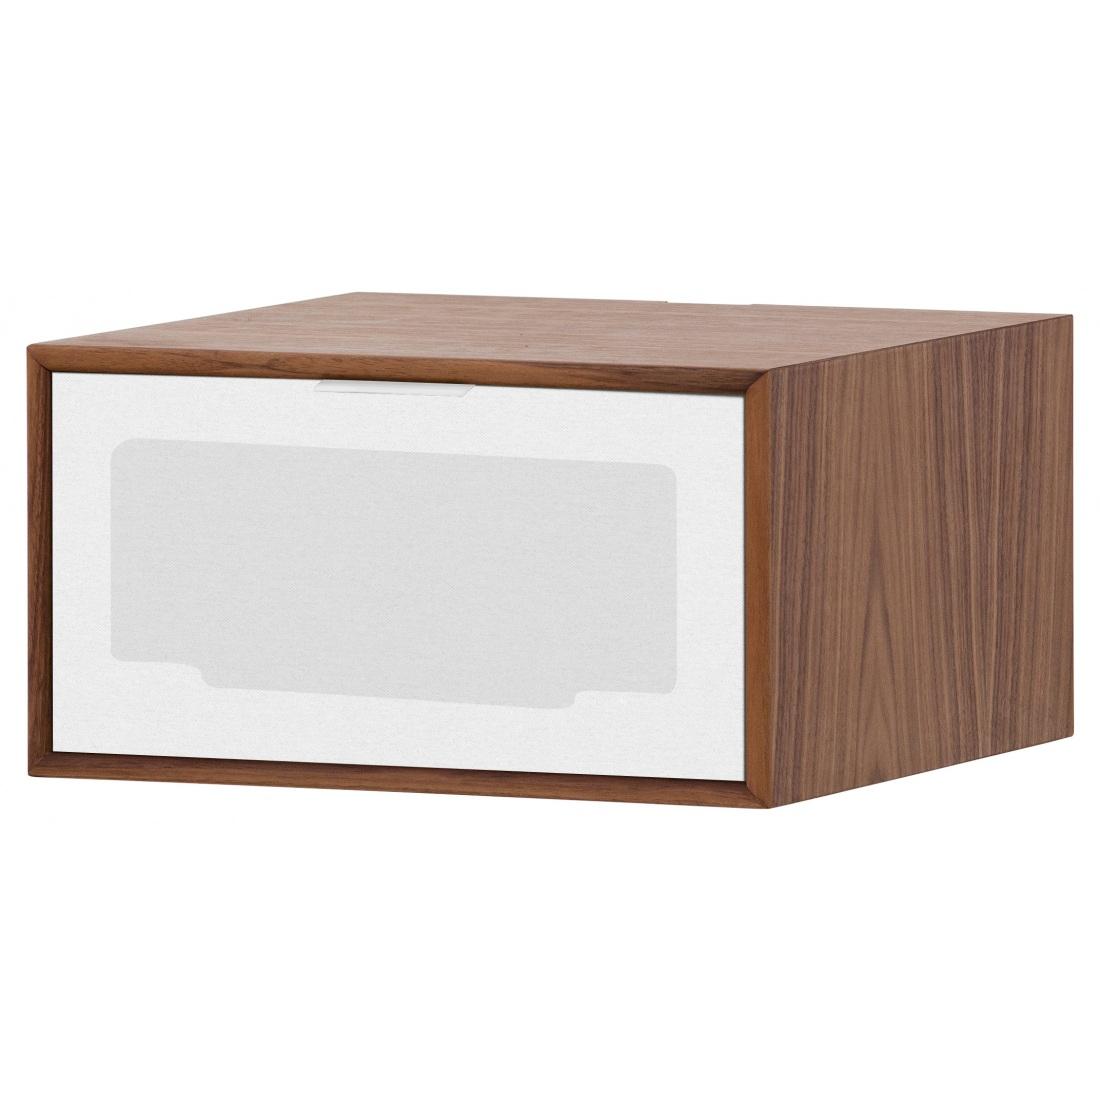 lowboard walnuss wei sideboard tv schrank moebel. Black Bedroom Furniture Sets. Home Design Ideas